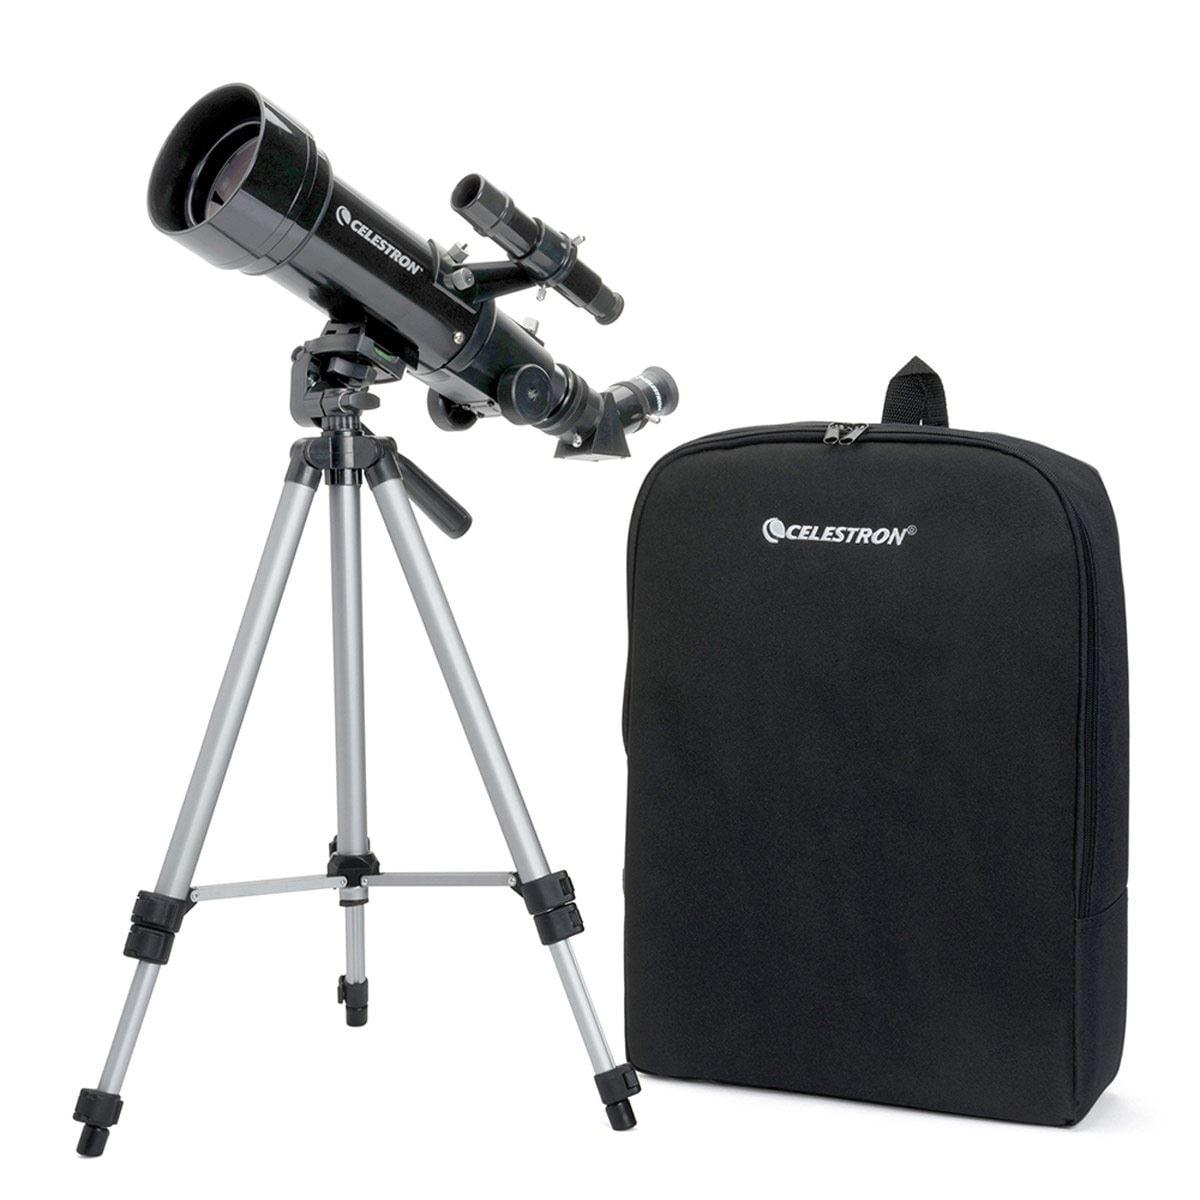 Telescopio Celestron 70 x 400 negro